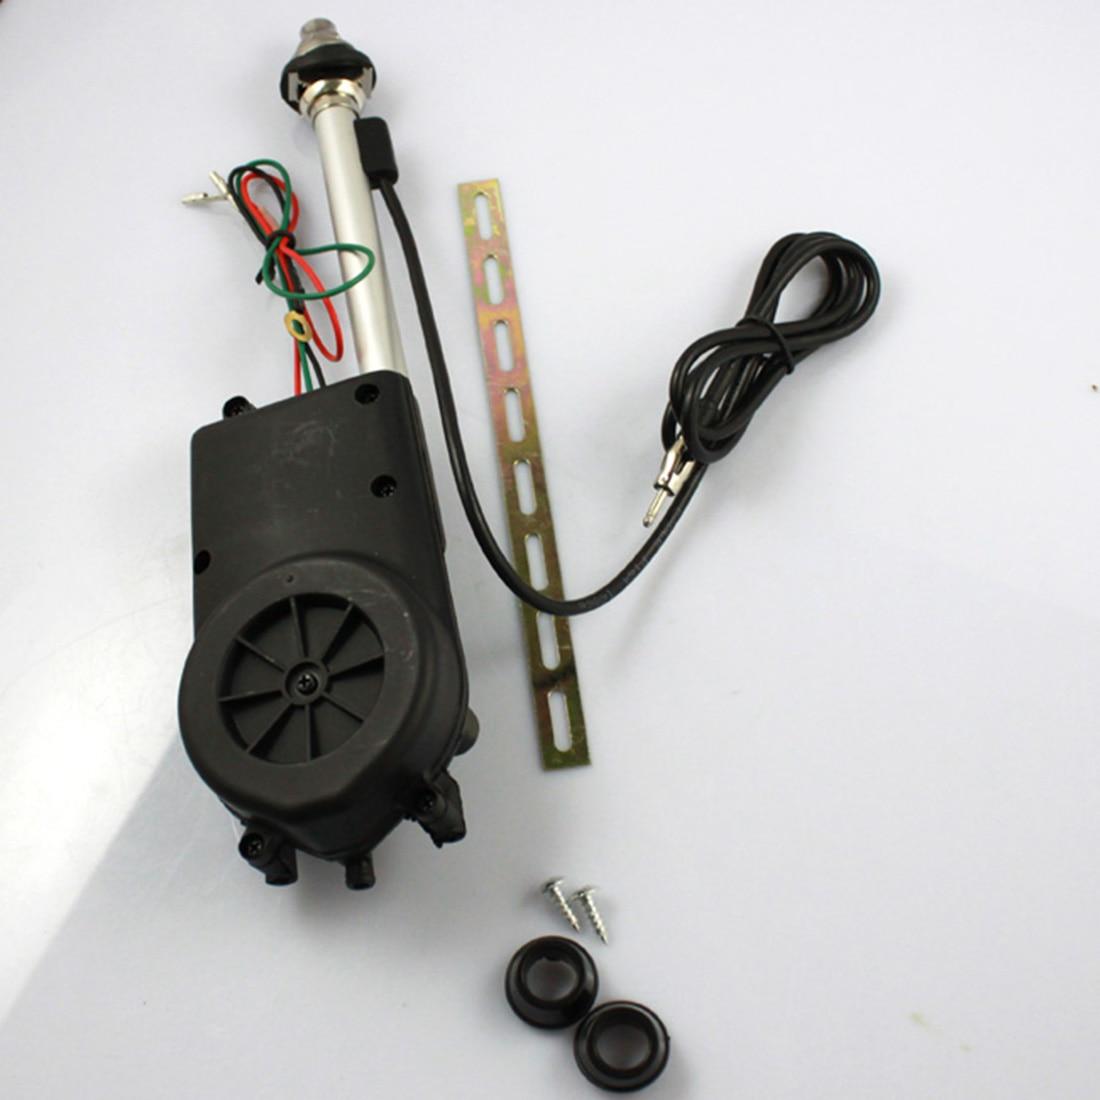 medium resolution of marsnaska new hot universal electric power antenna replacement kit car antenna vehicle am fm radio mast aerial car accessories